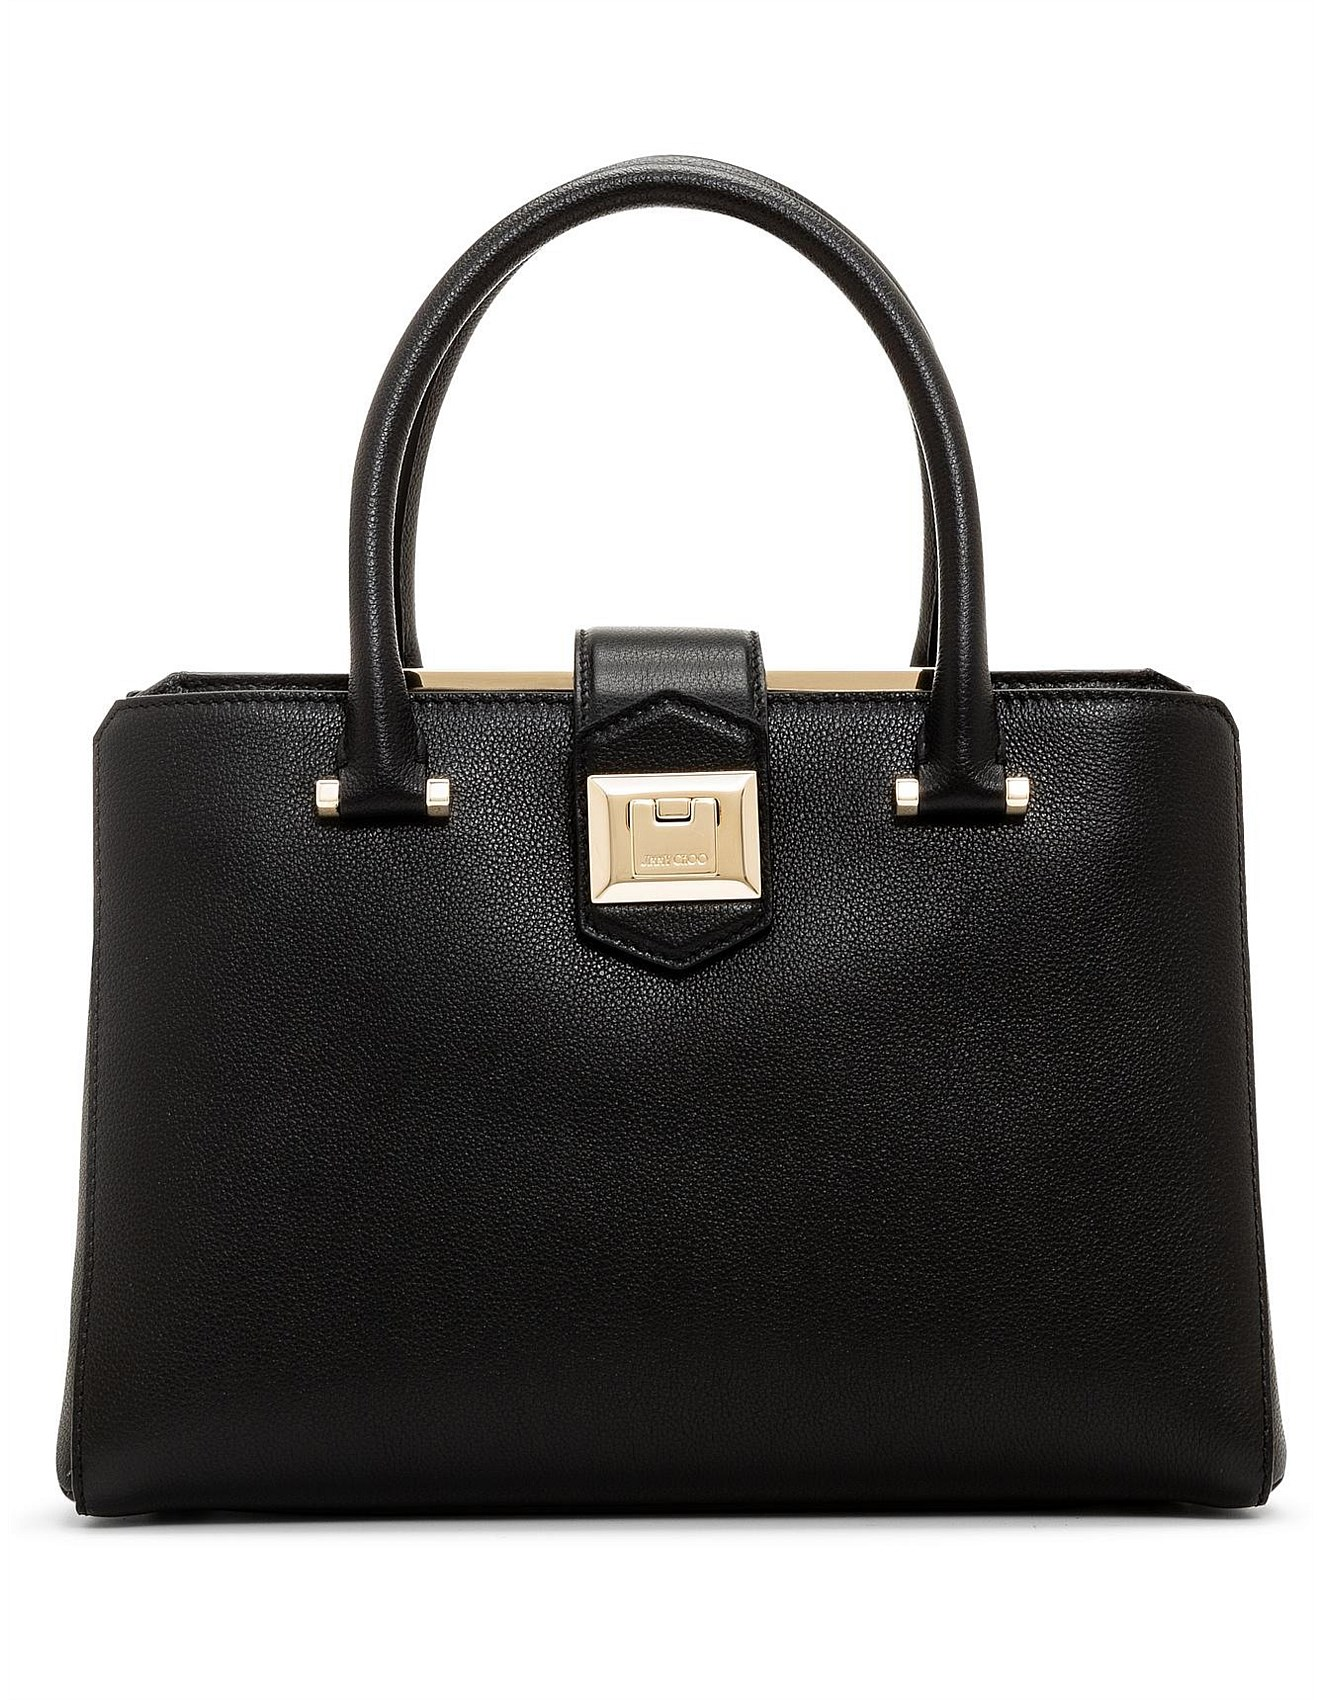 a91f40a7ca Jimmy Choo | Jimmy Choo Perfume & Shoes Online | David Jones - MARIANNE TOP  HANDLE BAG